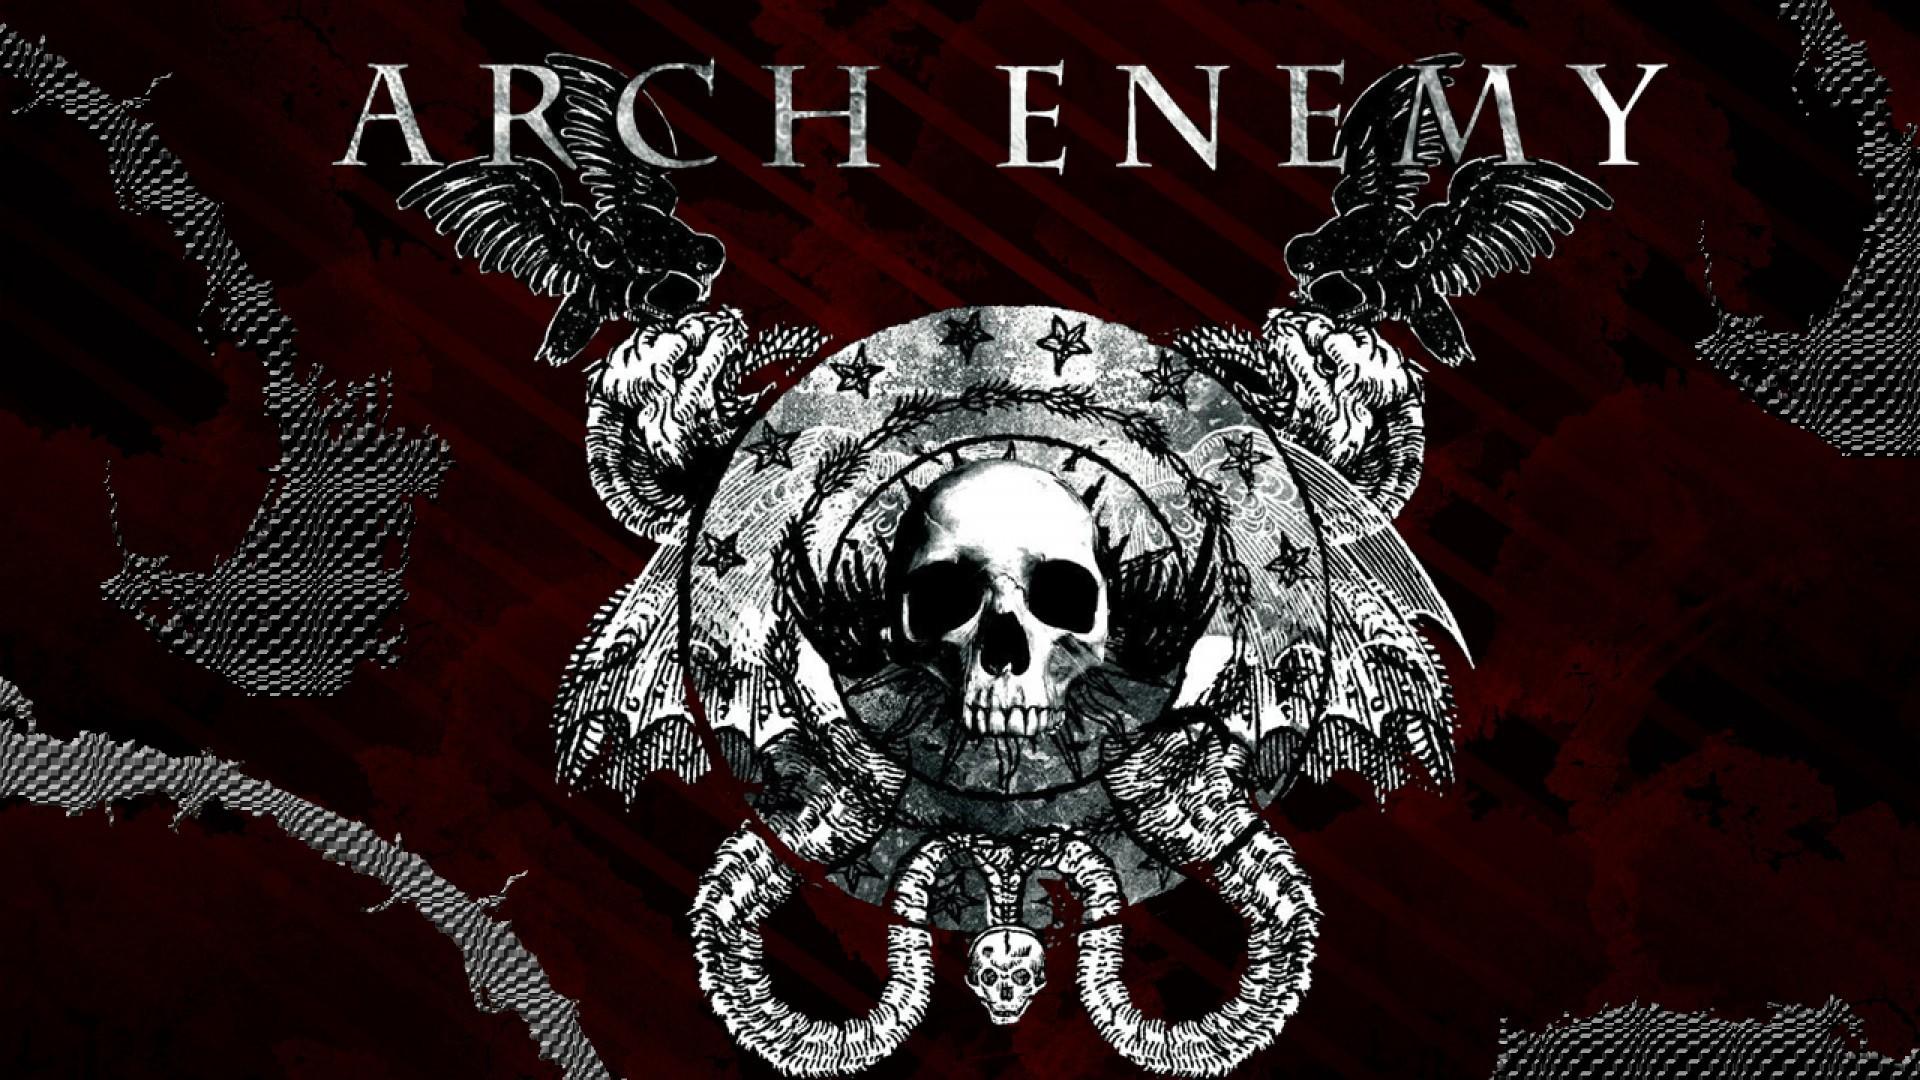 Arch Enemy Hd Desktop